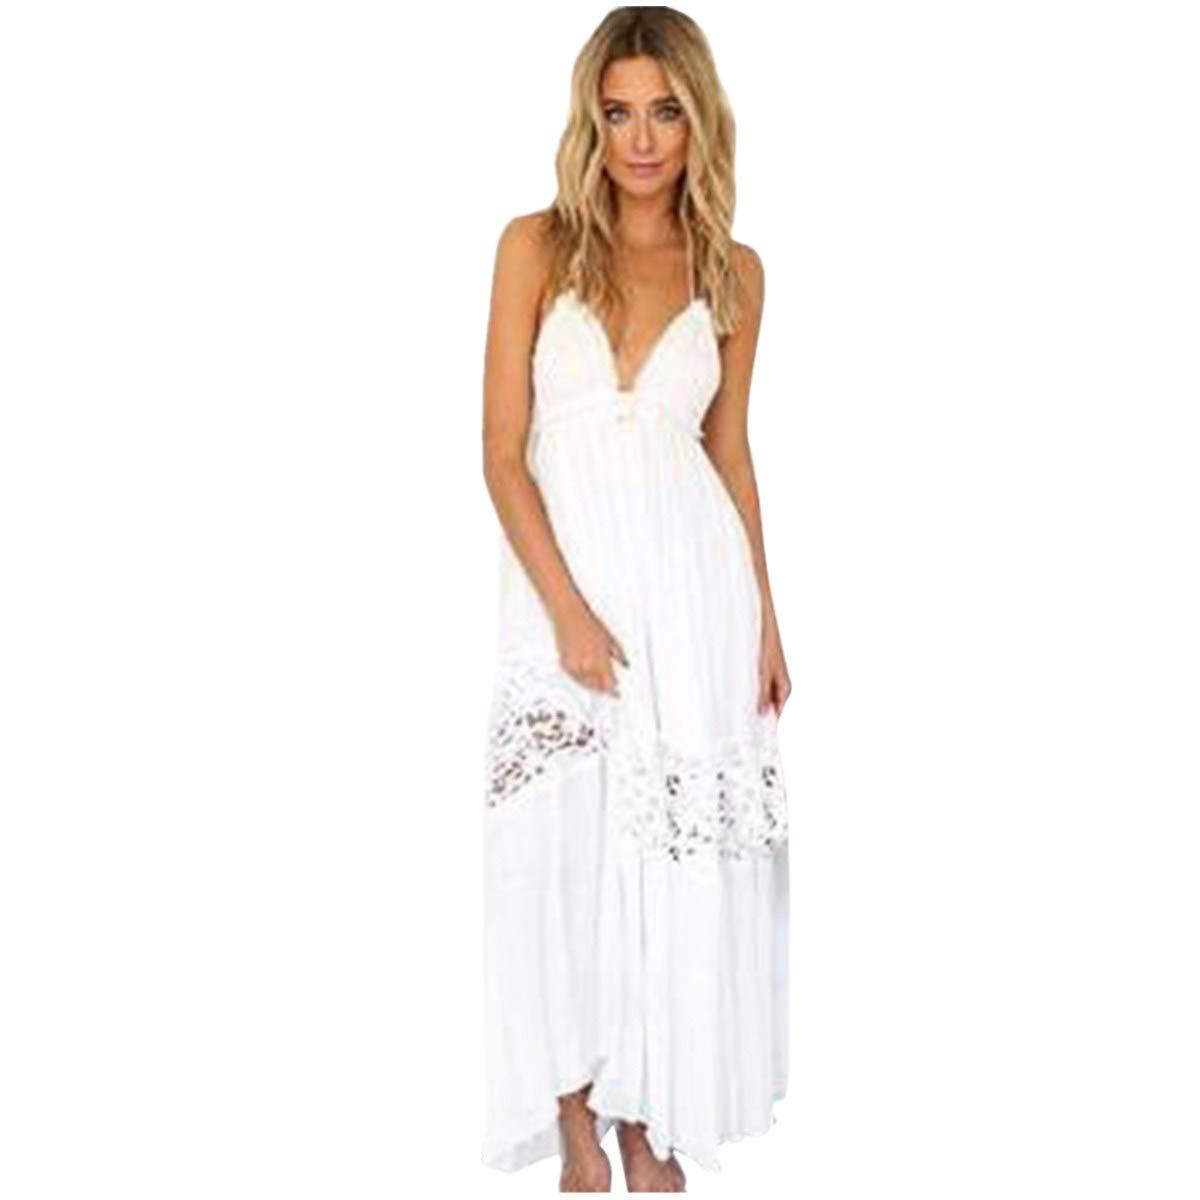 68d2b519ba4 Amazon.com  AmyDong Women s Bohemian Dress